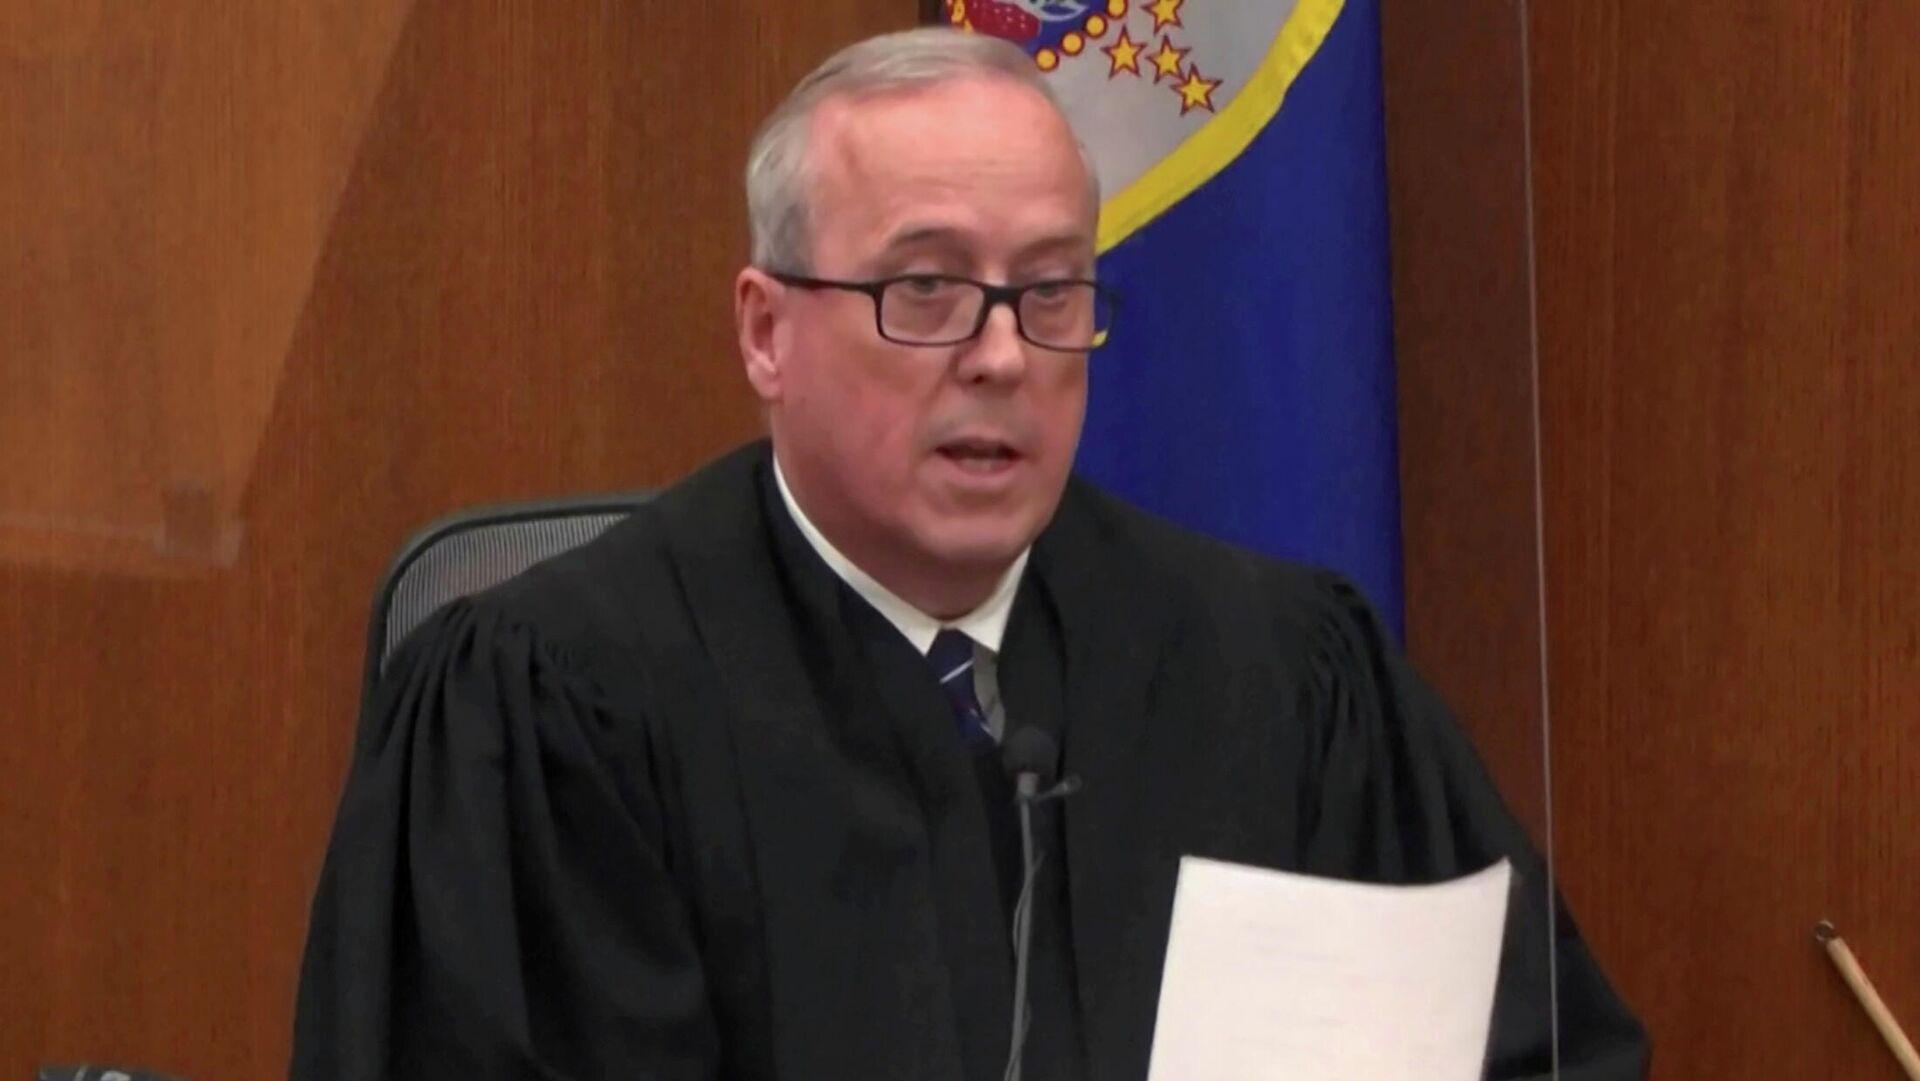 El juez de Minesota, EEUU, Peter Cahill - Sputnik Mundo, 1920, 12.05.2021